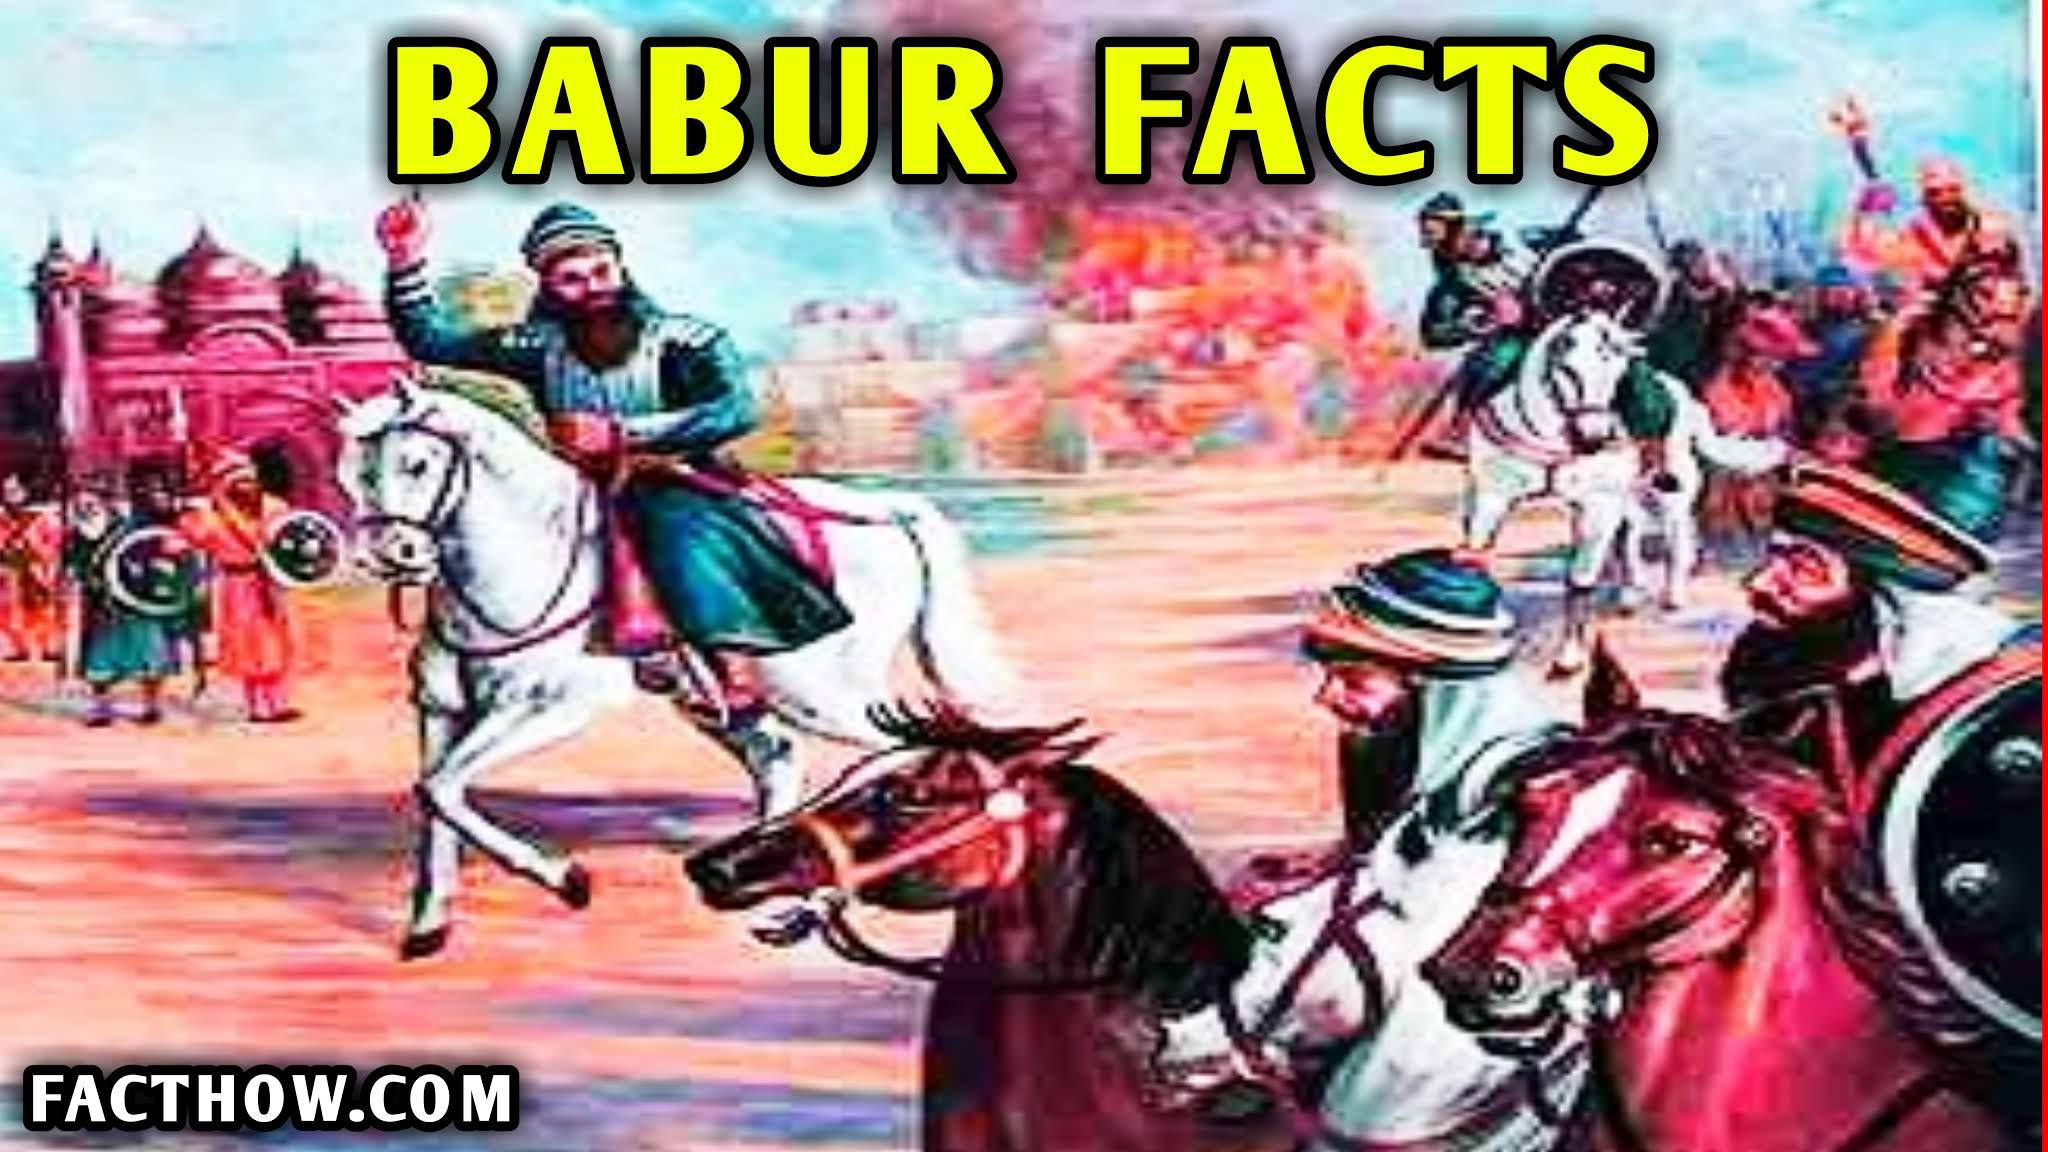 Mughal-emperor-history-facts-in-hindi-akbar-babur-aurangzeb-history-itihaas-mughal-saamrajya-tathya-facts-hindi-unbelievable-facts-about-mughals-facthow-fact-how-fact-world